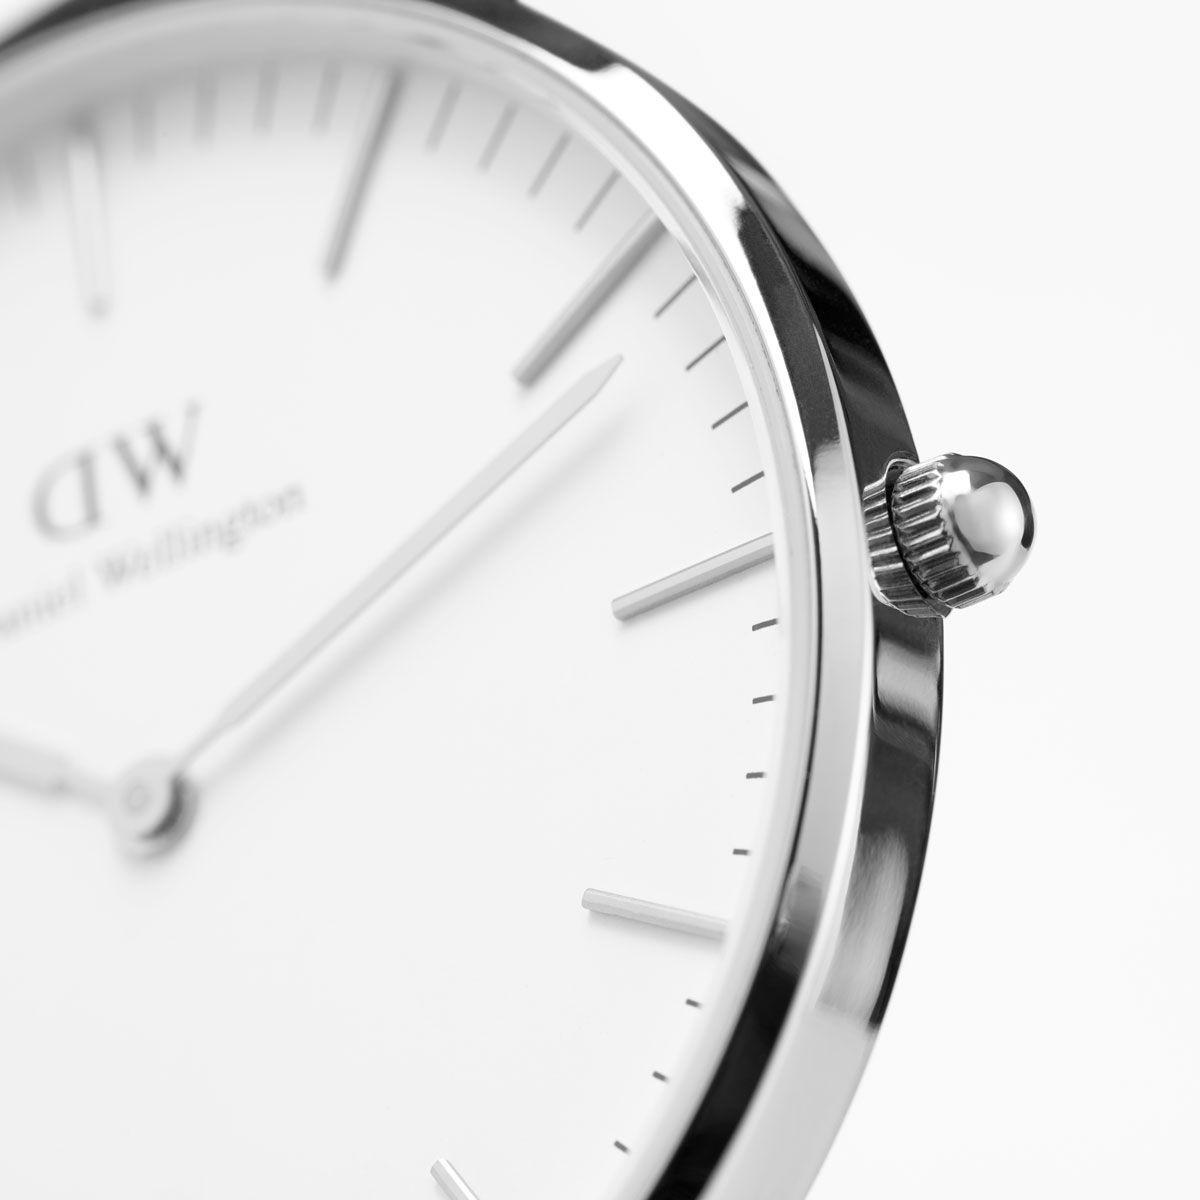 dw官网 dw手表官网 dw中国官网 dw官方旗舰店 DW DW官网  W Classic St Mawes Silver 36mm